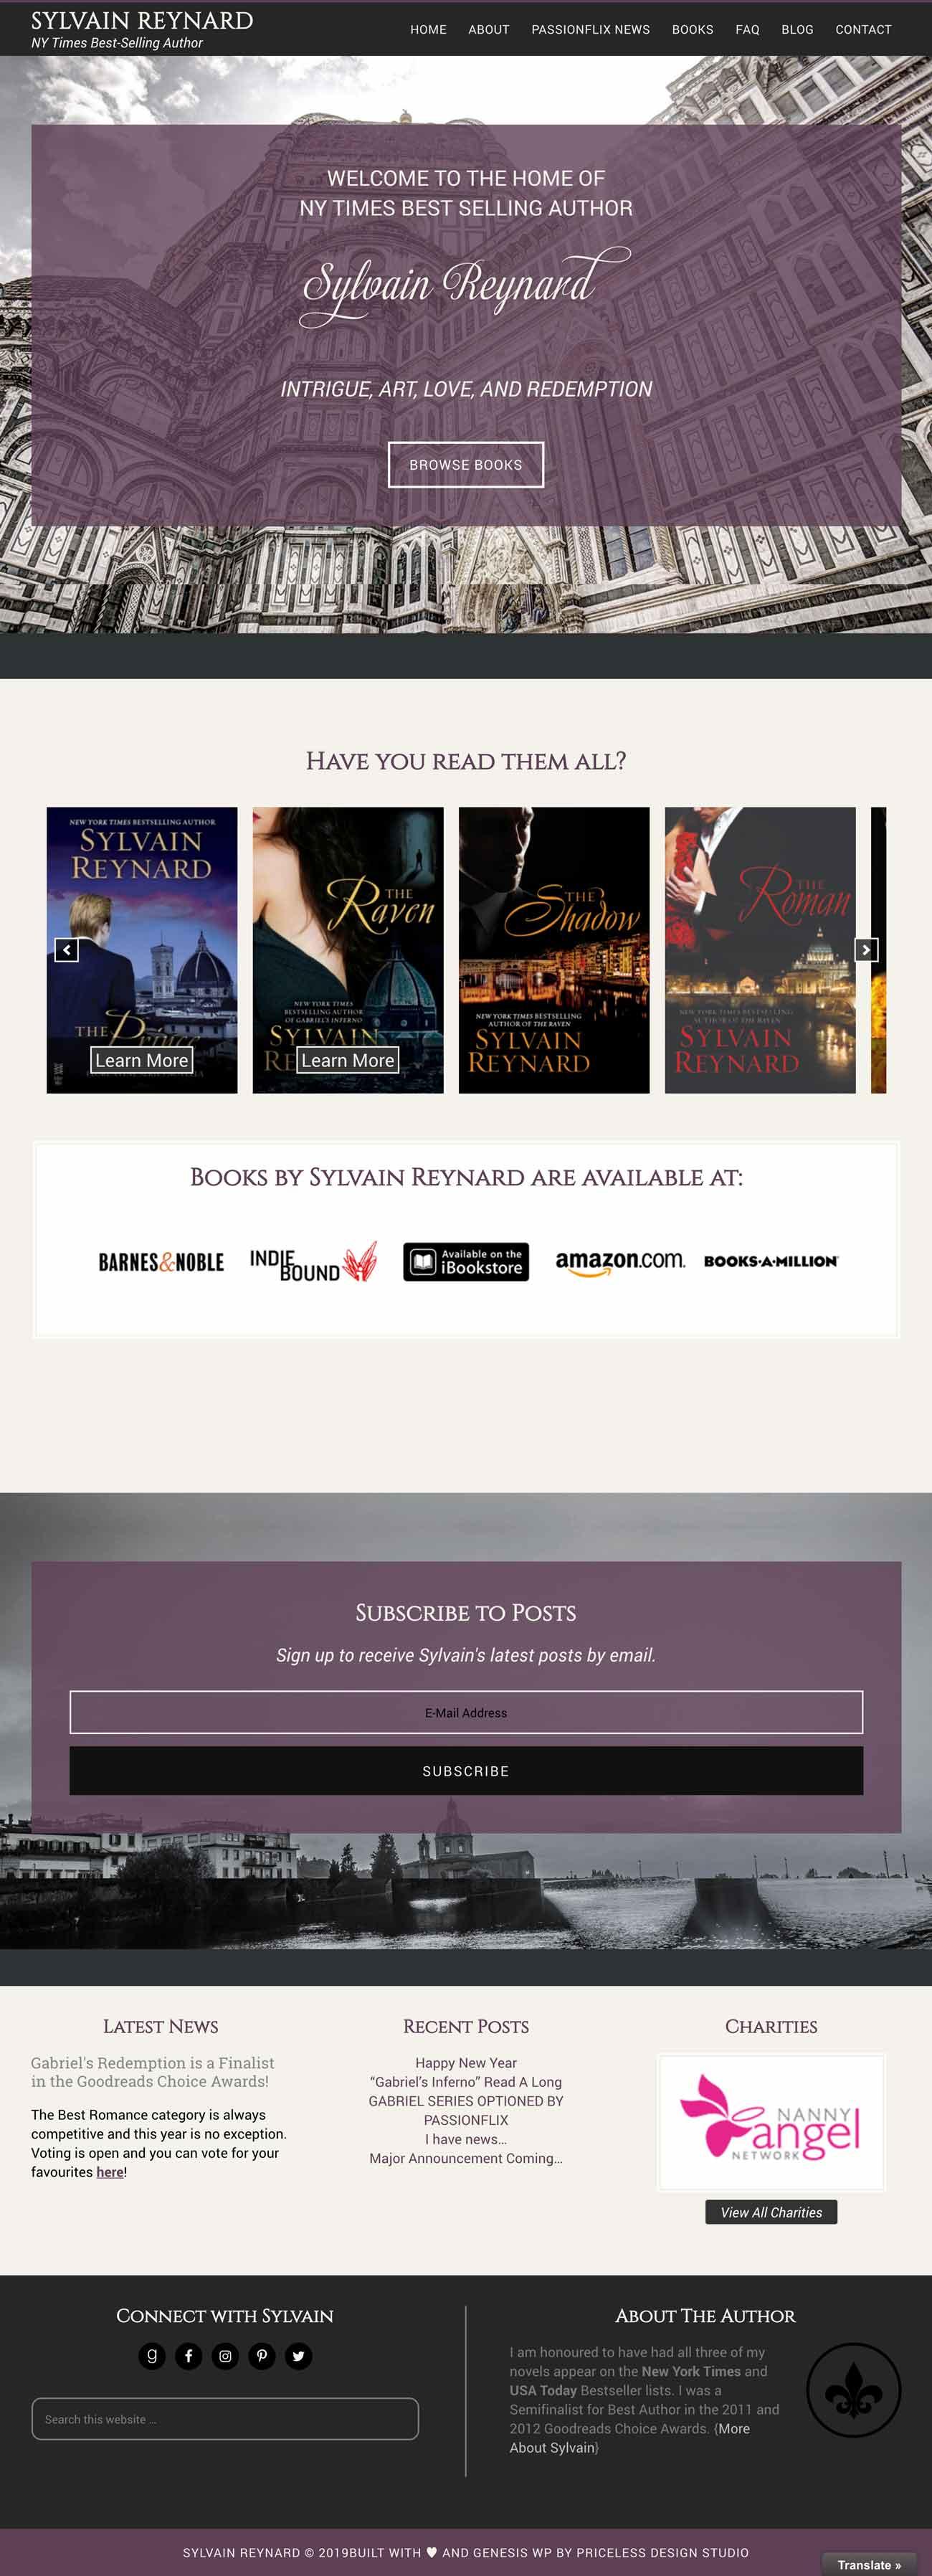 sylvainreynard_homepage